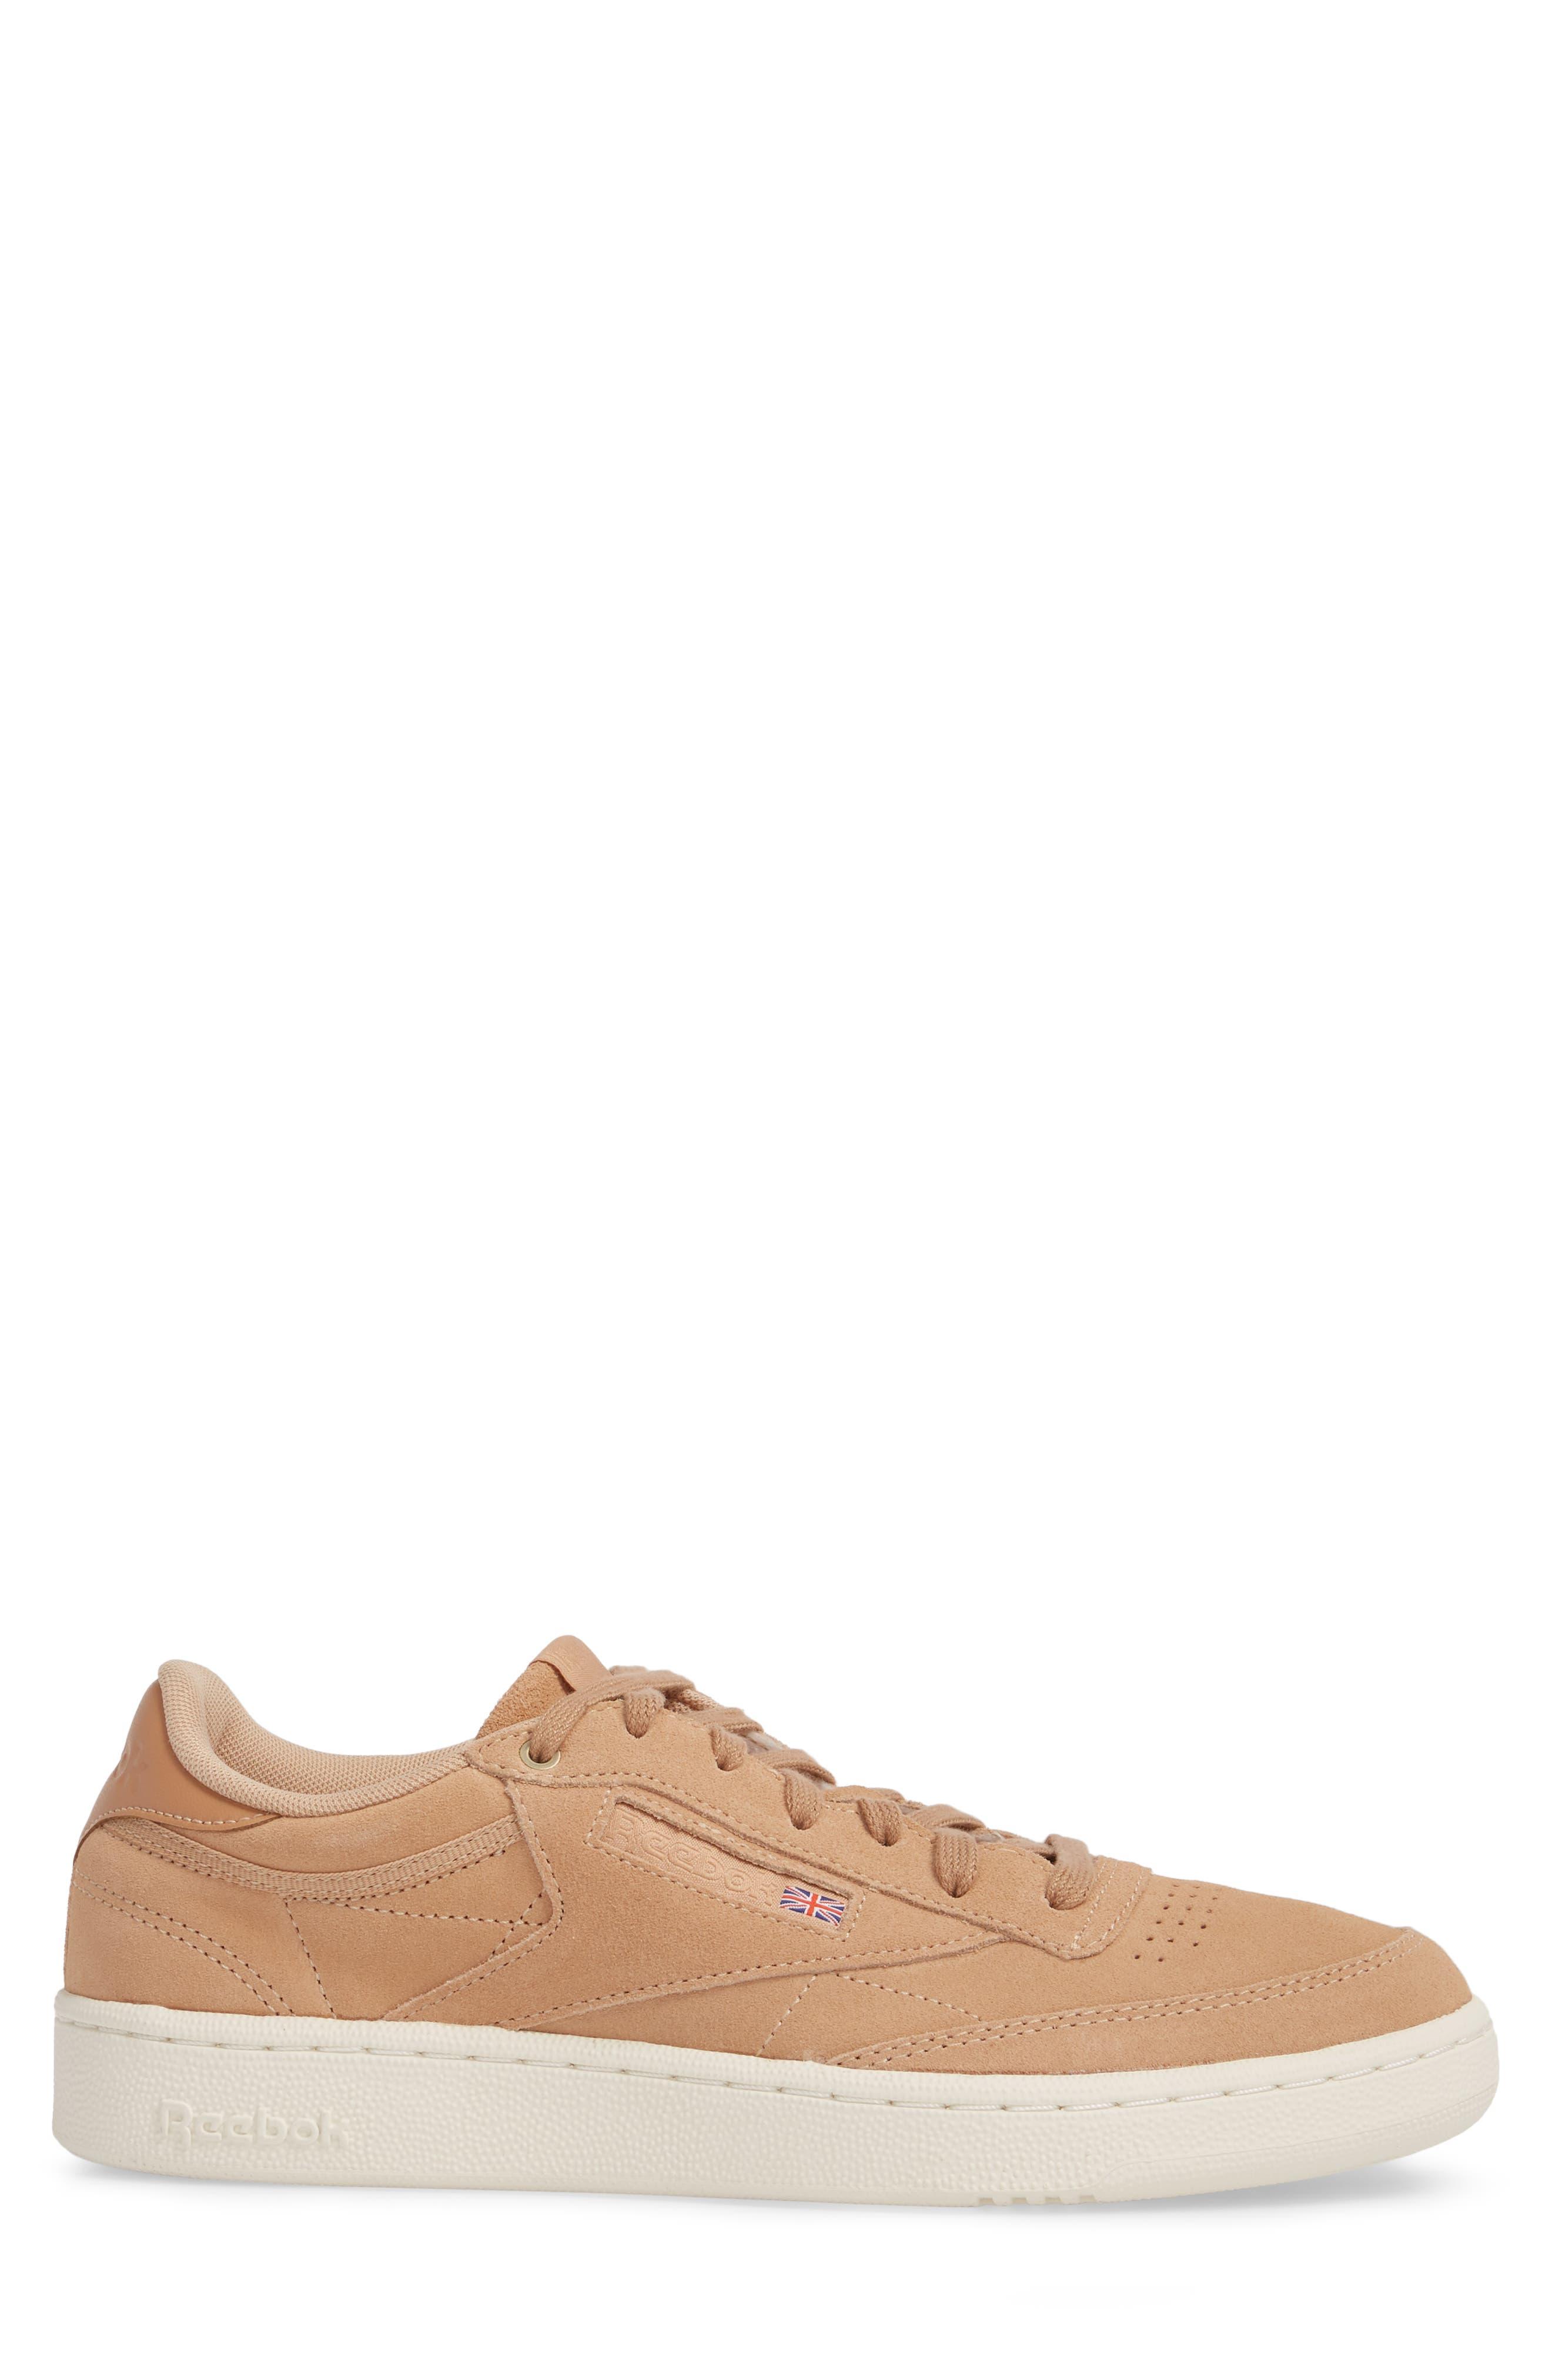 Club C 85 MCC Sneaker,                             Alternate thumbnail 3, color,                             Make Up/ Chalk